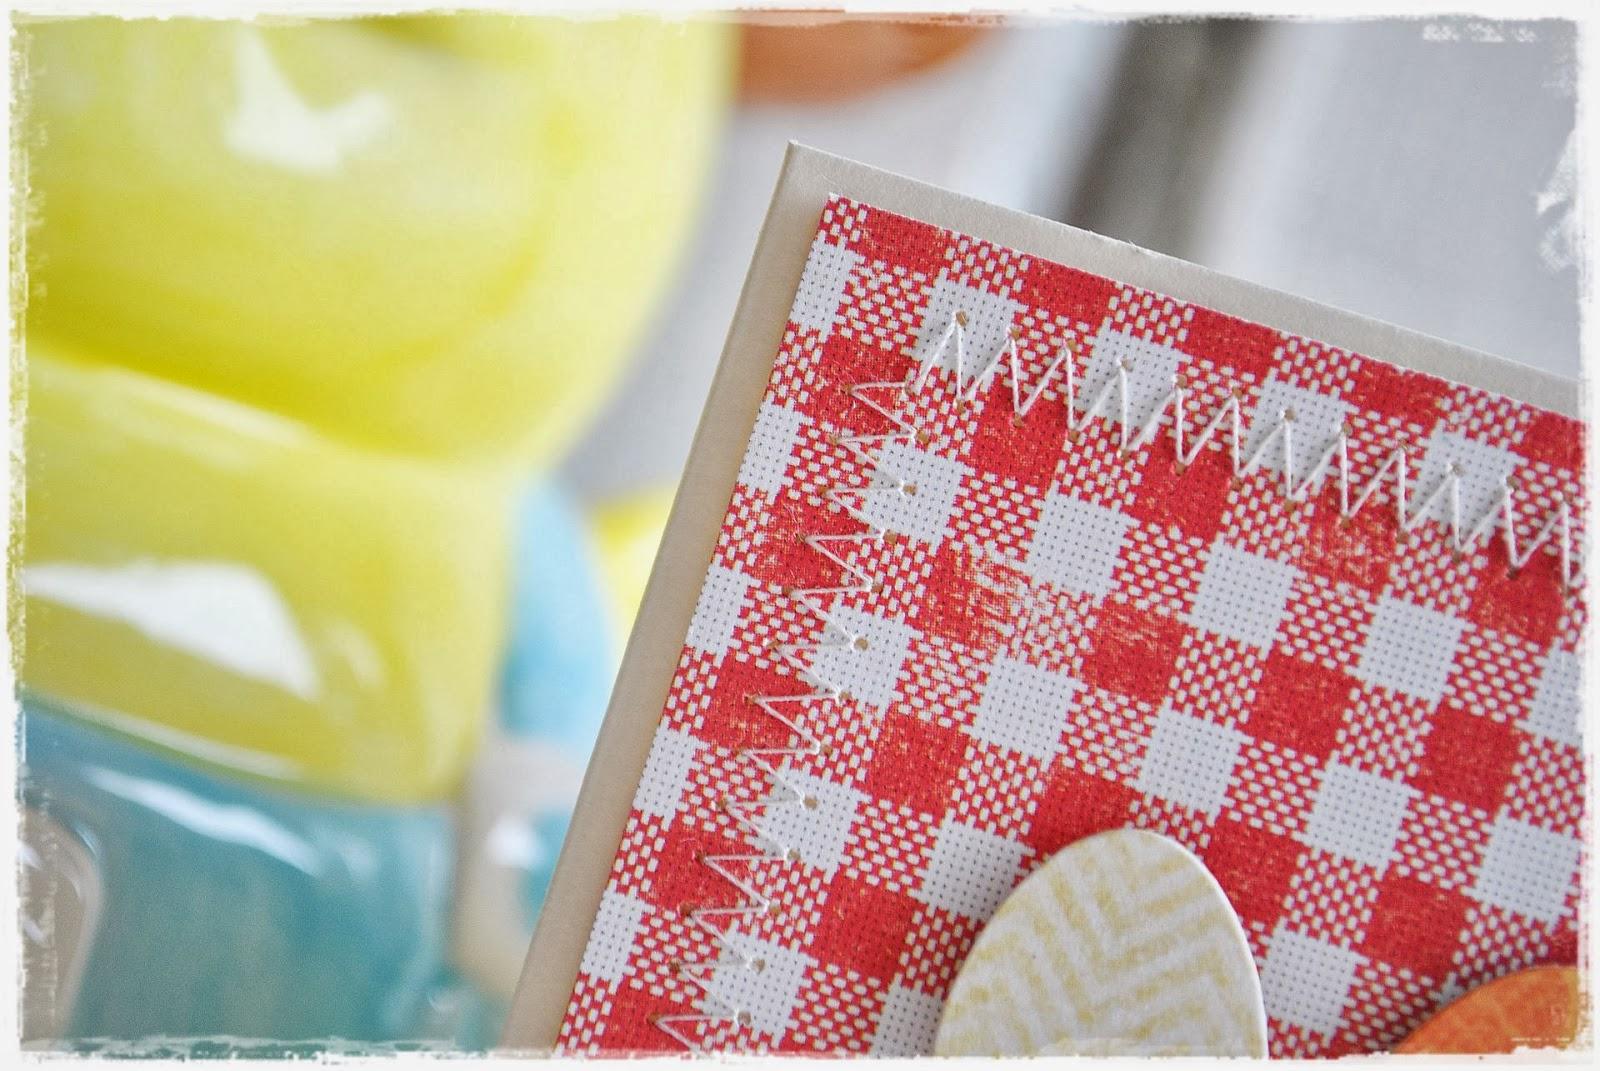 kartka wielkanocna z jajkami scrapbooking